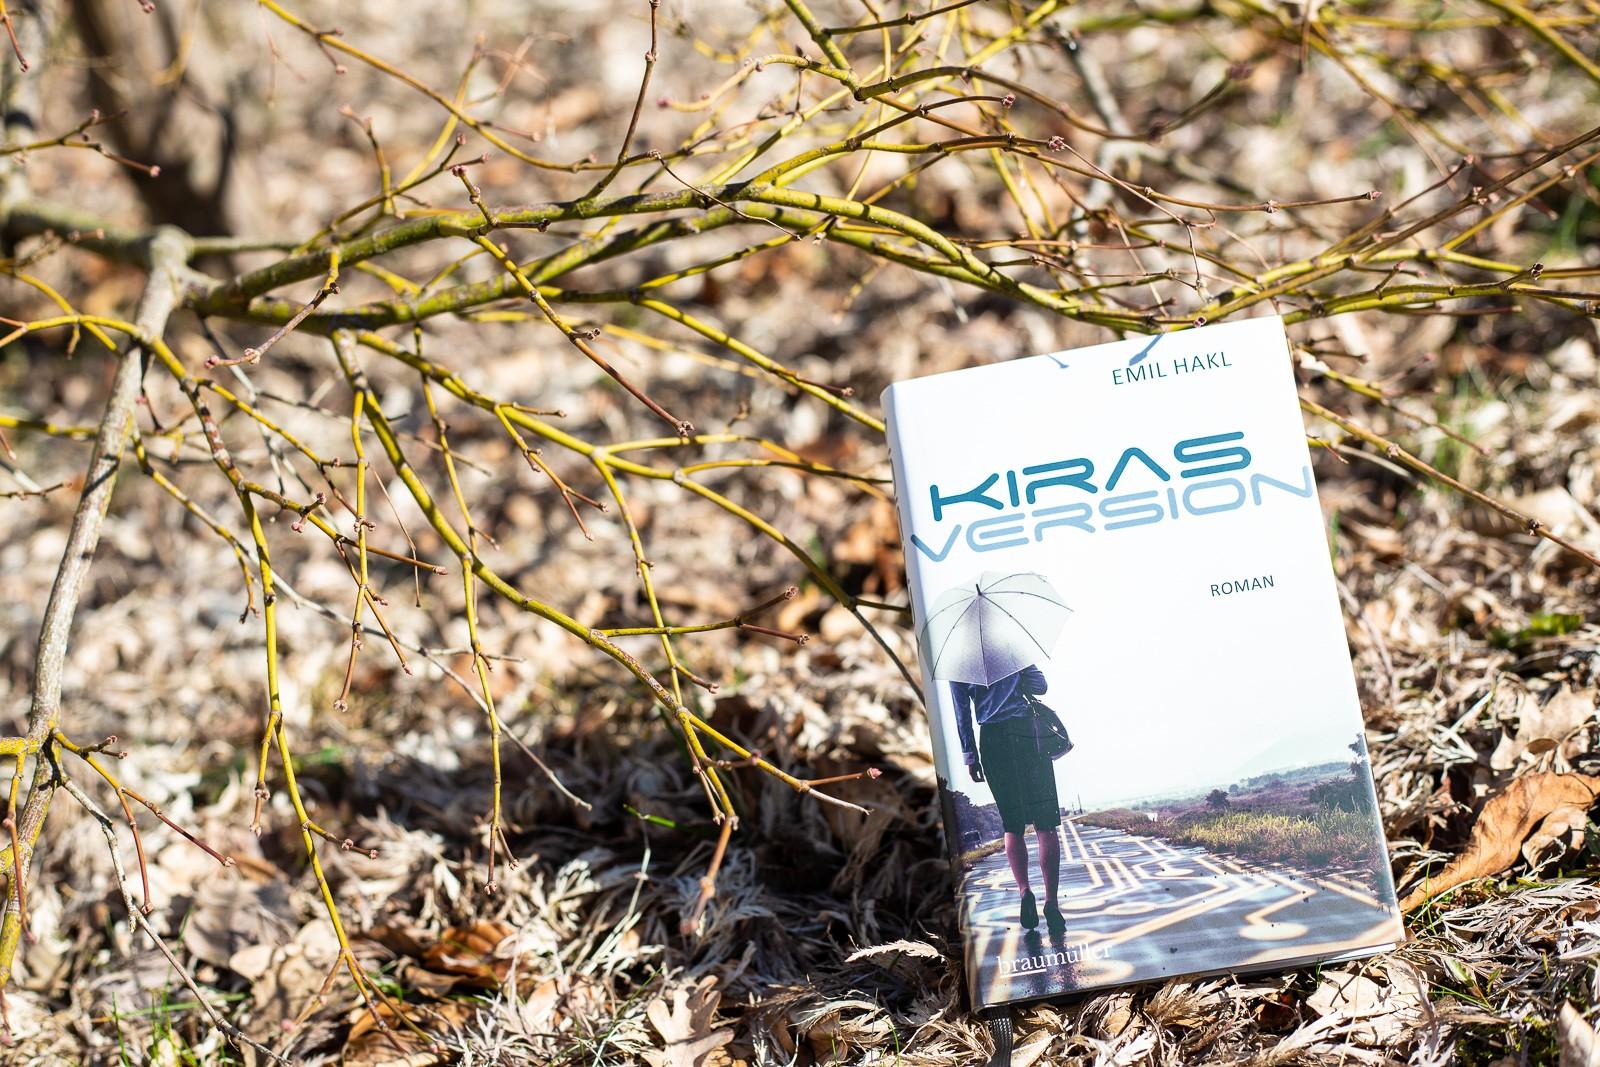 Kiras Version - Emil Hakl